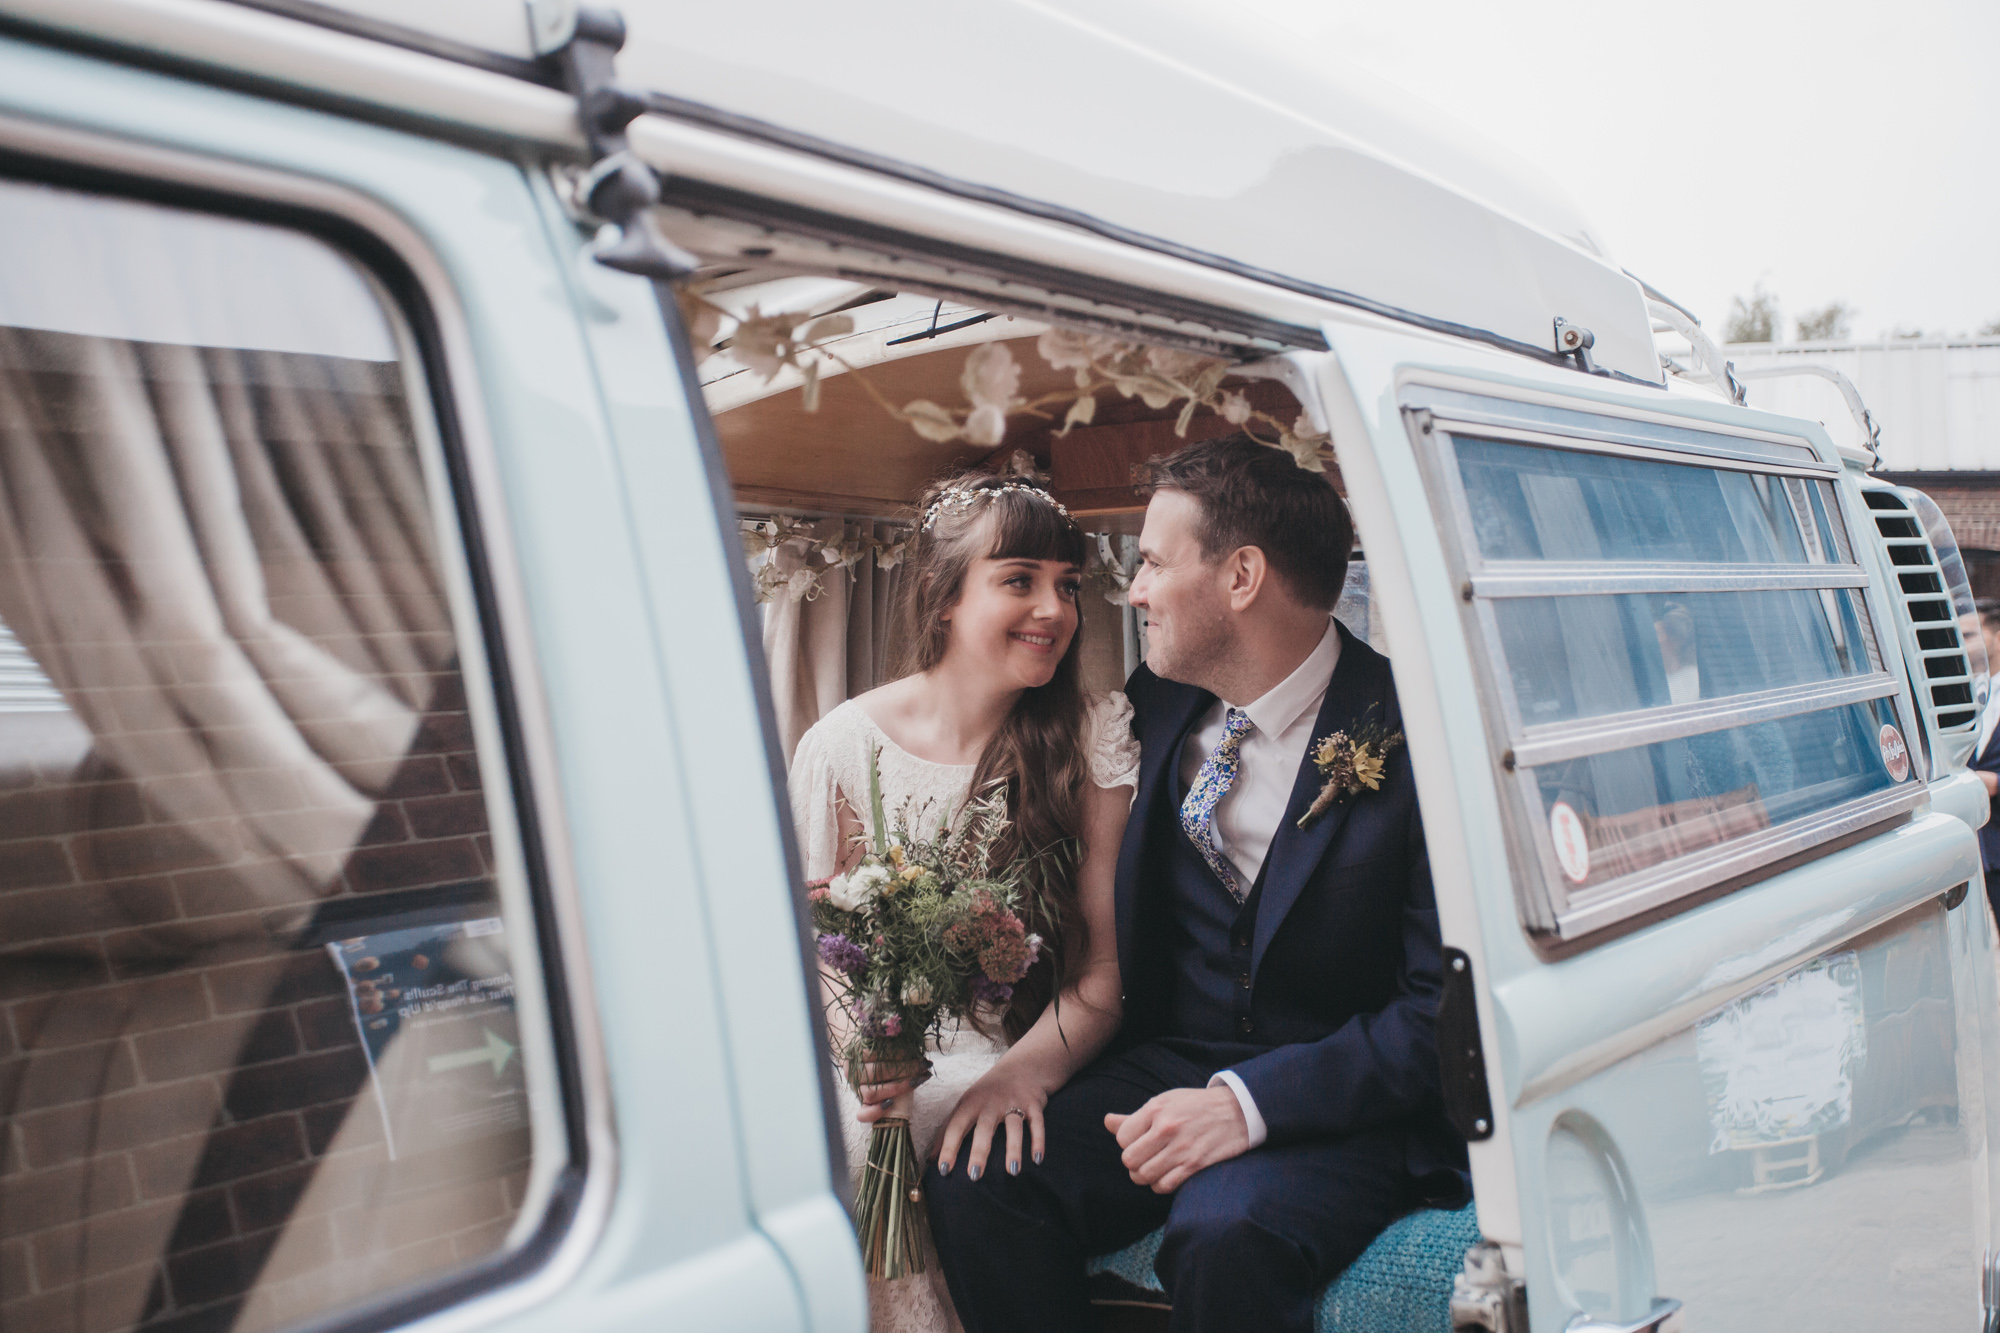 Kristy-Back-Garden-Outdoor-Wedding-Sheffield-Industrial-Warehouse-Wedding-Bohemian-Kate-Beaumont-Dahlia-Dress-34.jpg